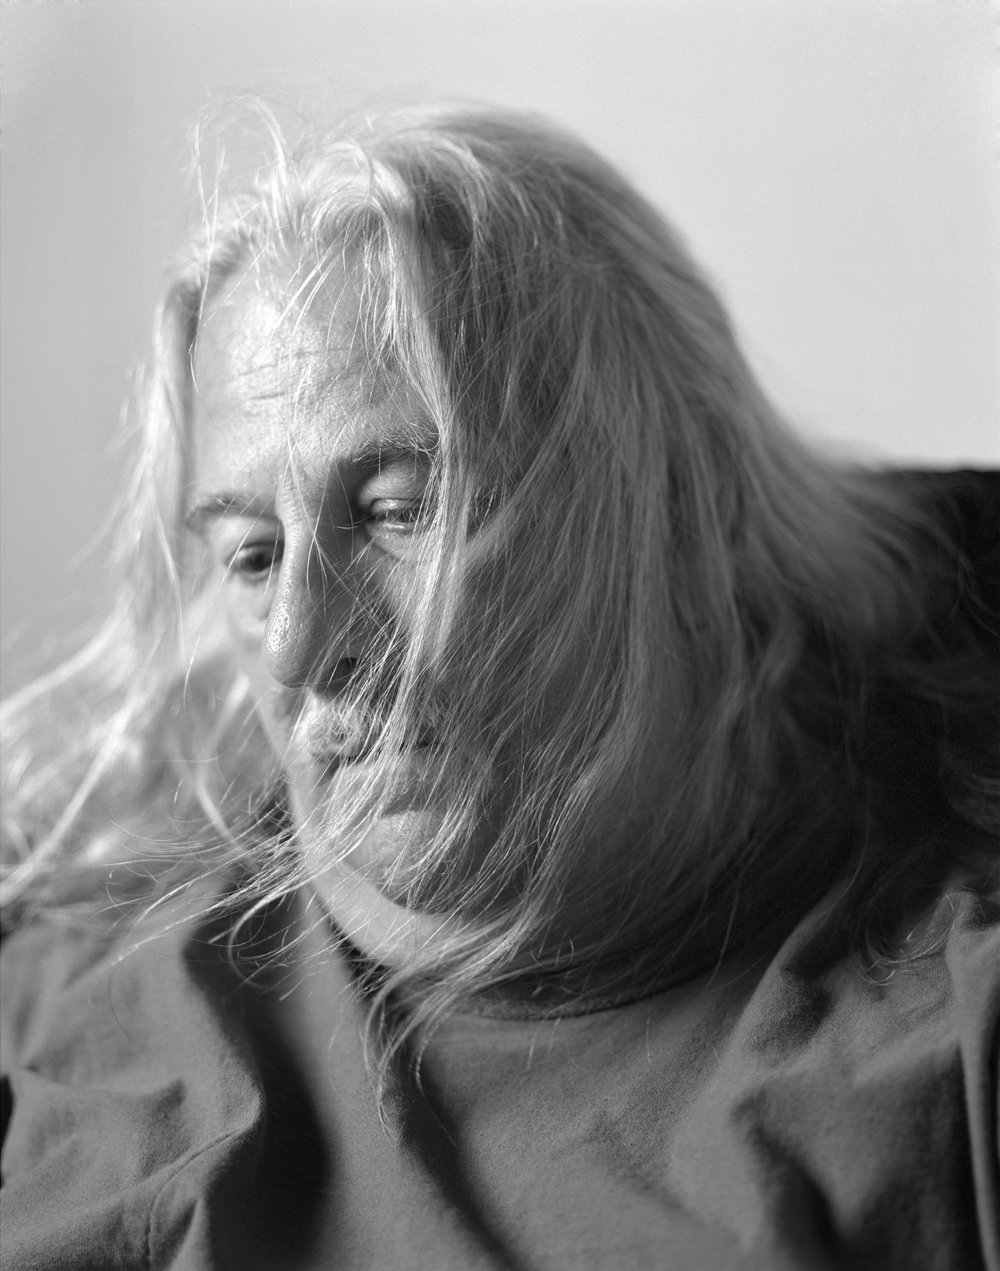 John Seated, 2016